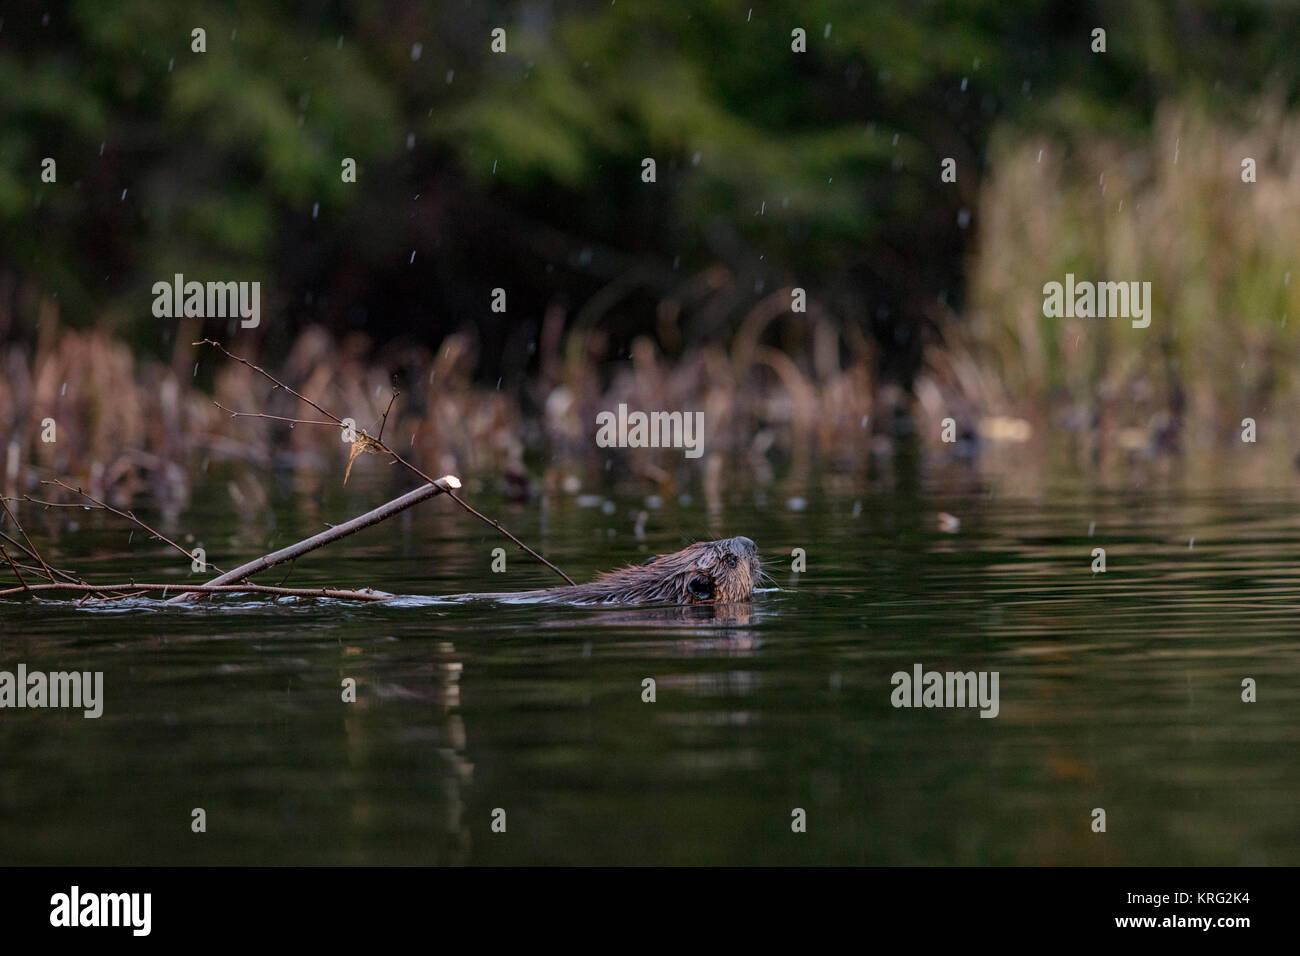 MAYNOOTH, HASTINGS HIGHLANDS, ONTARIO, CANADA - November 7, 2017: A North American Beaver (Castor Canadensis). - Stock Image